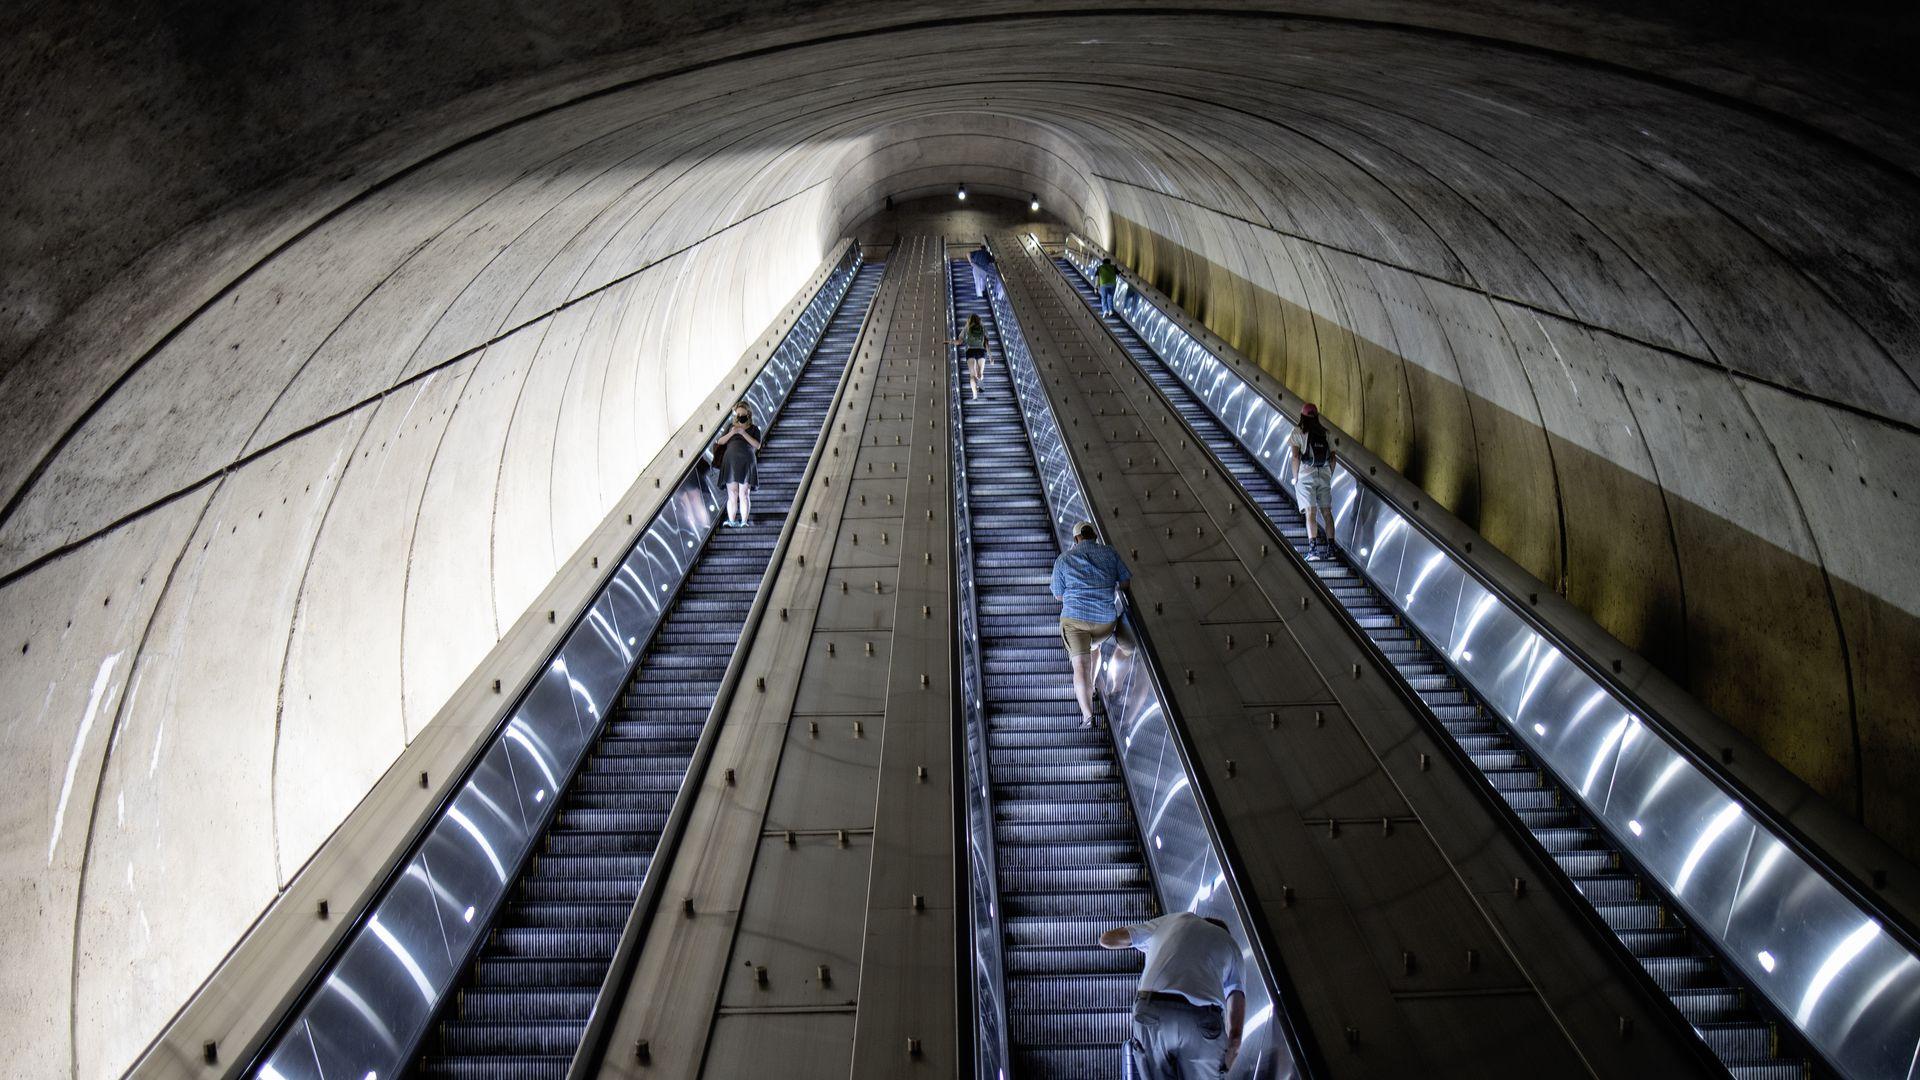 A Metrorail station escalator